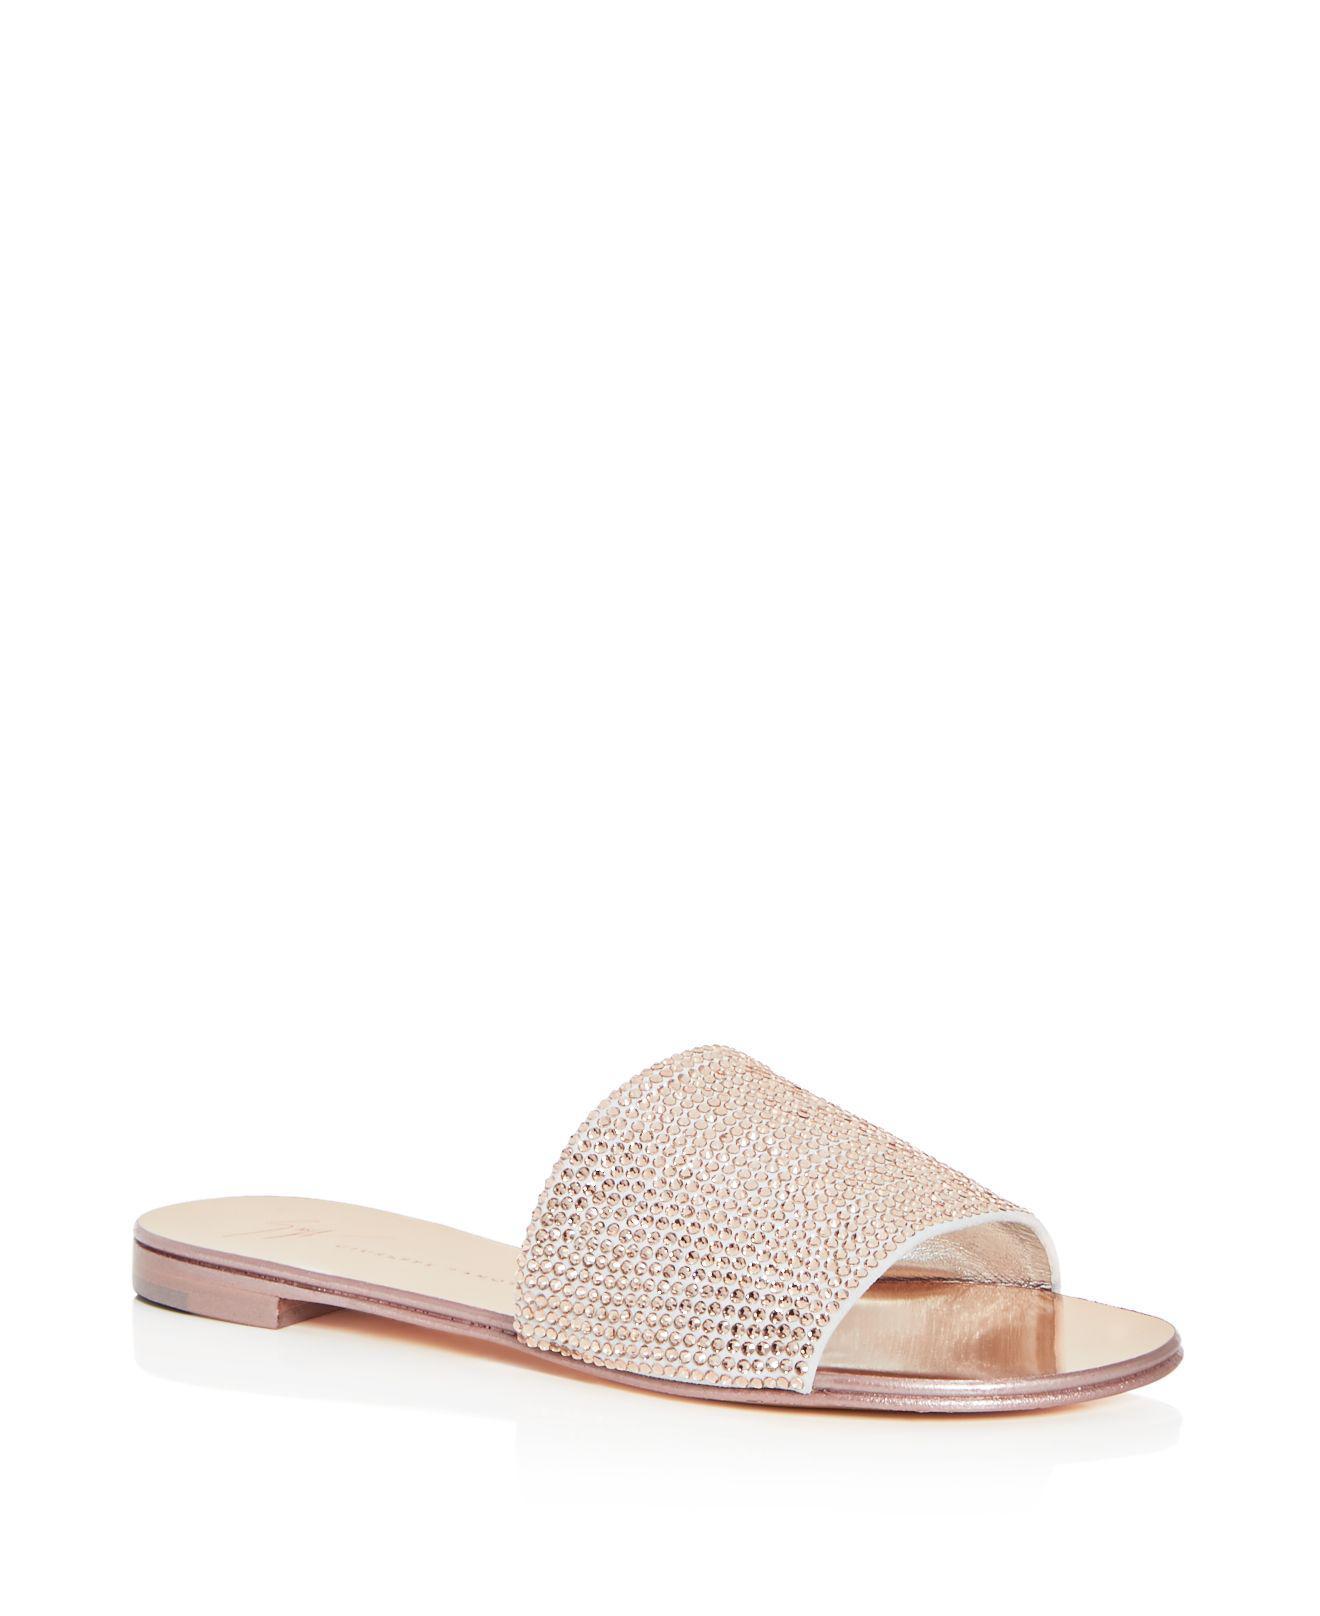 Giuseppe Zanotti Women's Swarovski Crystal Embellished Slide Sandals fILyklRpR